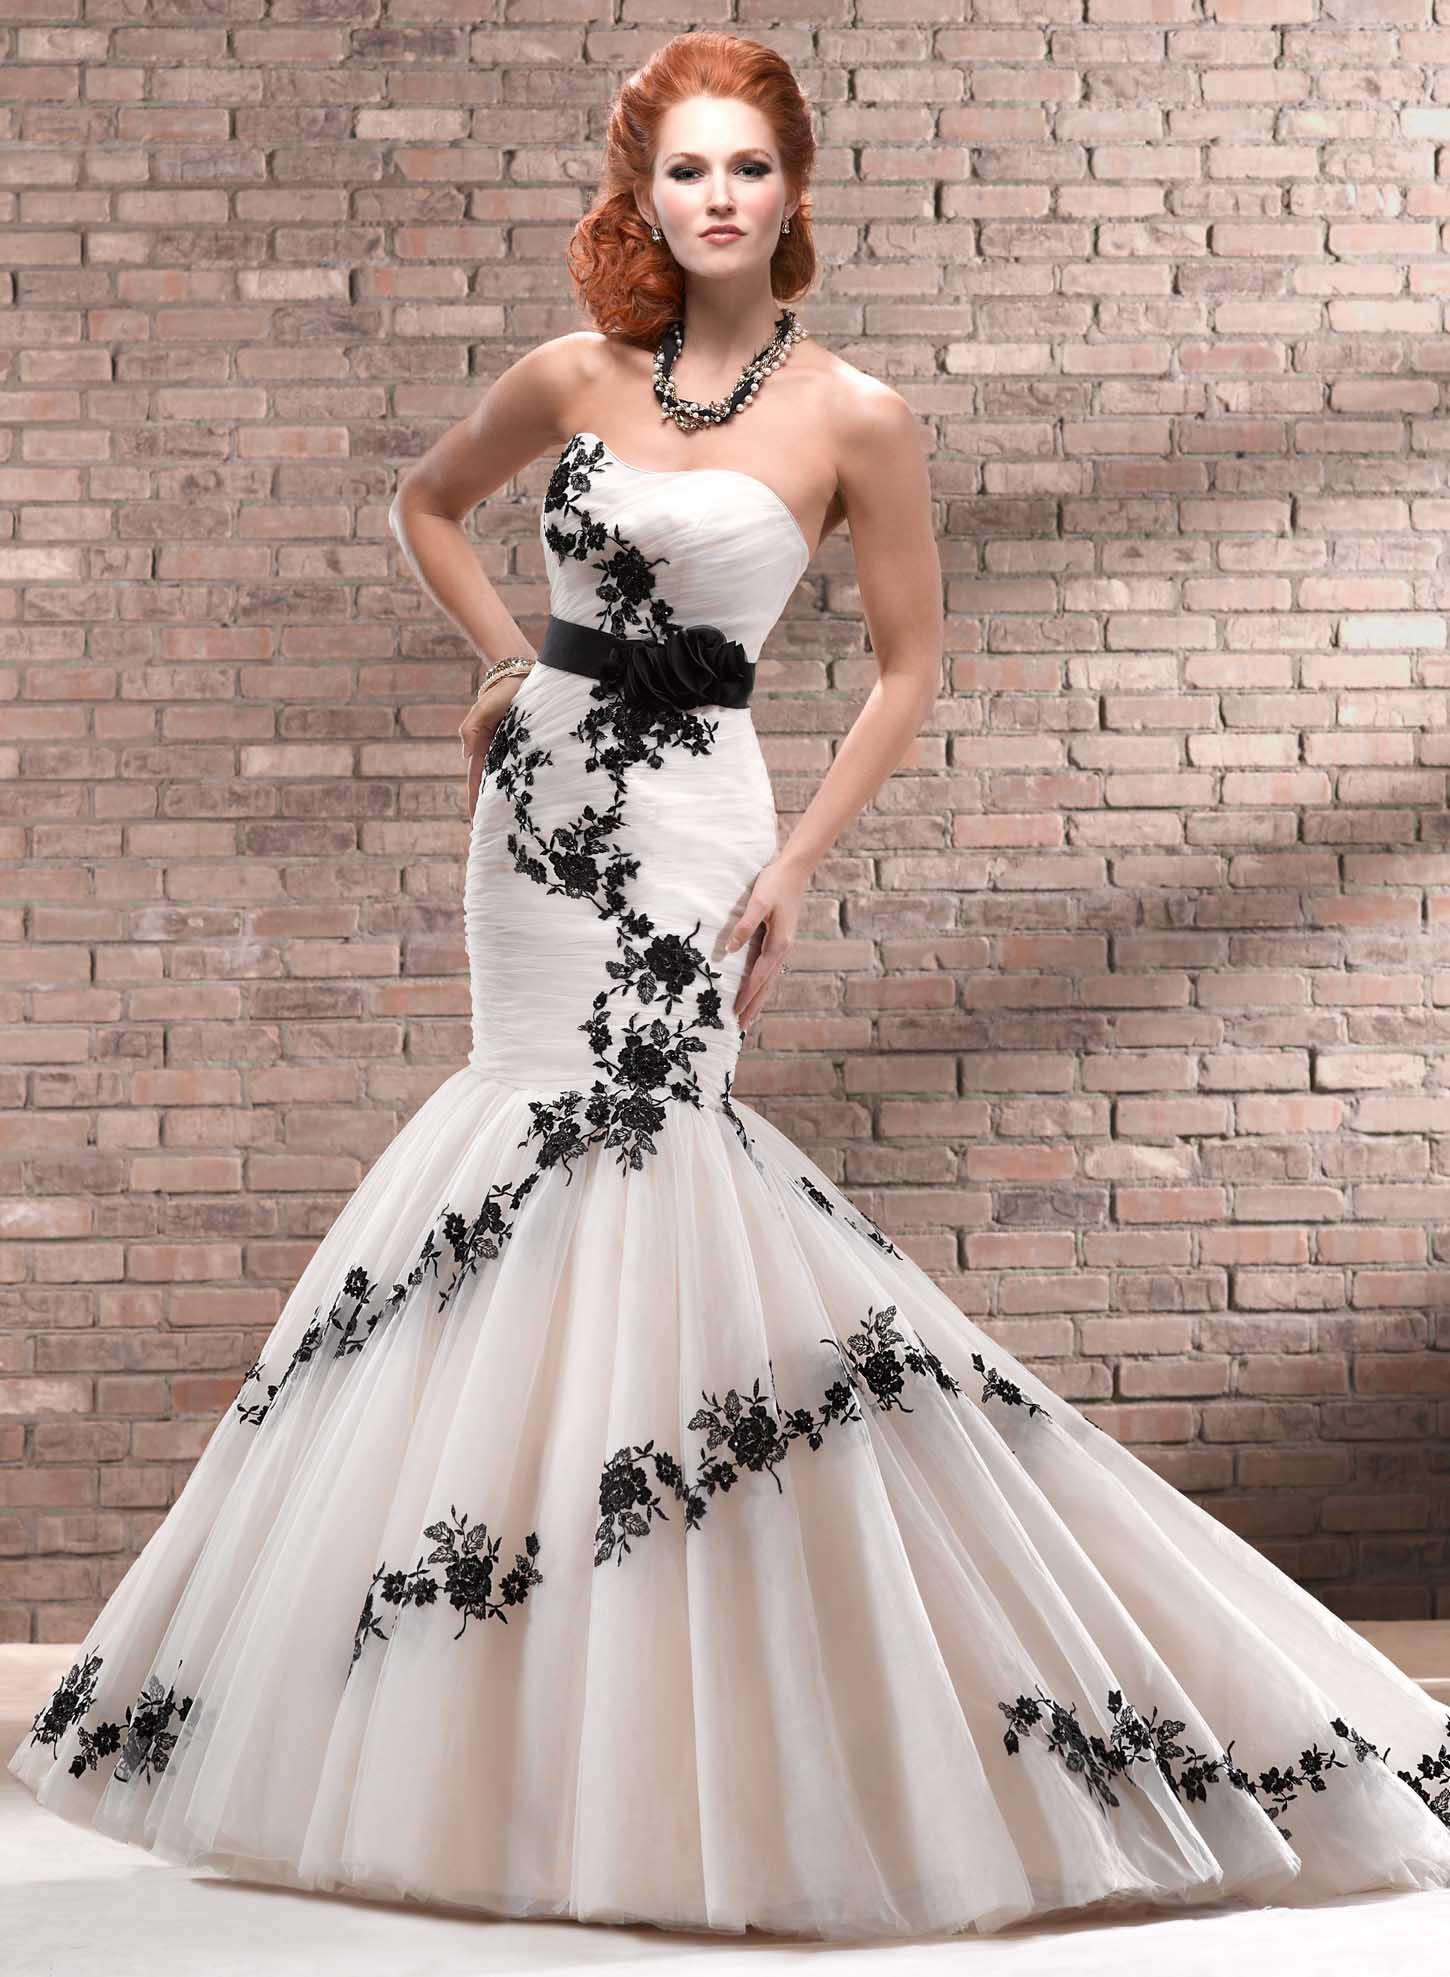 black and white wedding dress 1 starpless black u0026 white wedding dress ZVLFRIL